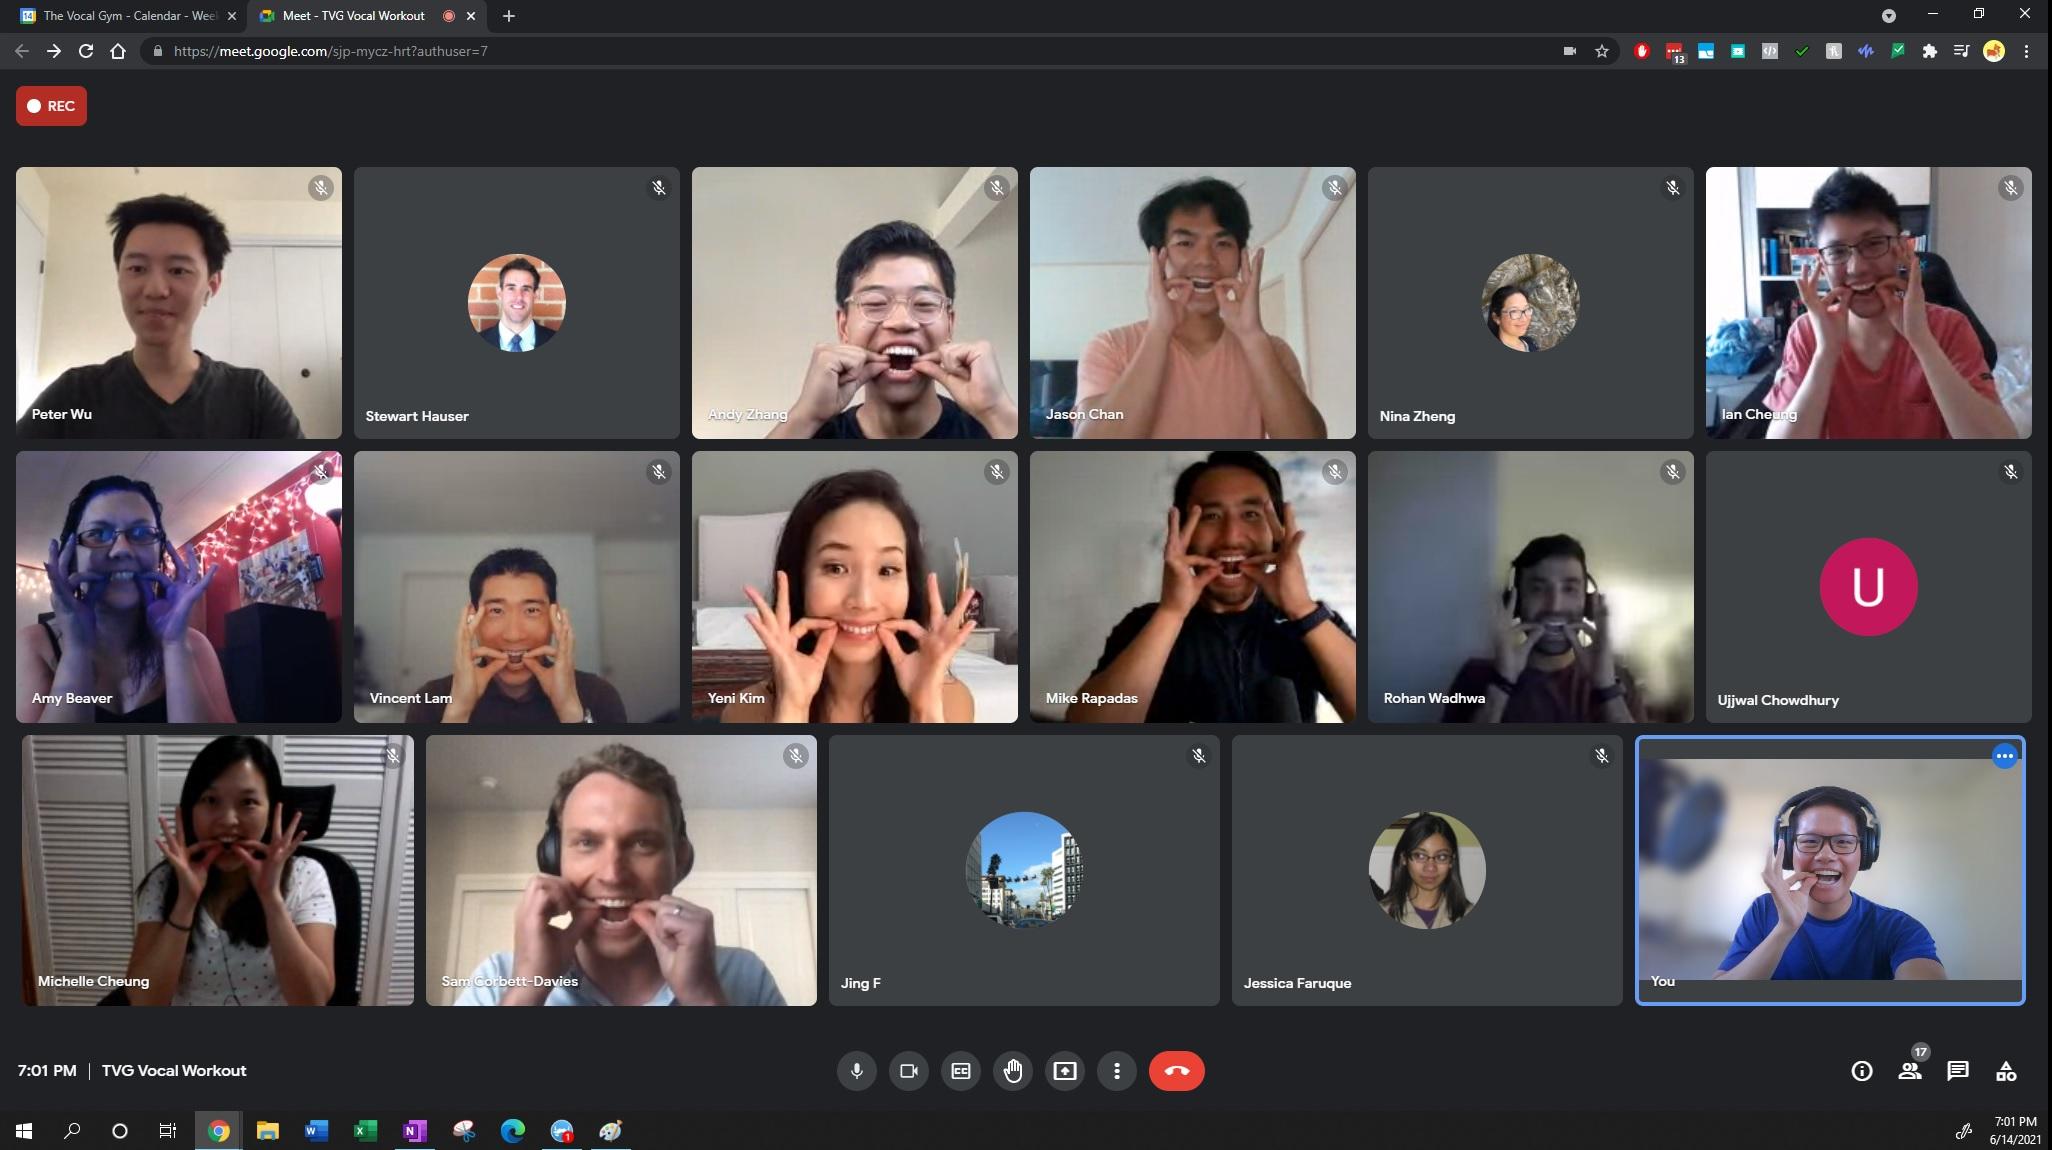 TVG 210614 group photo (1)